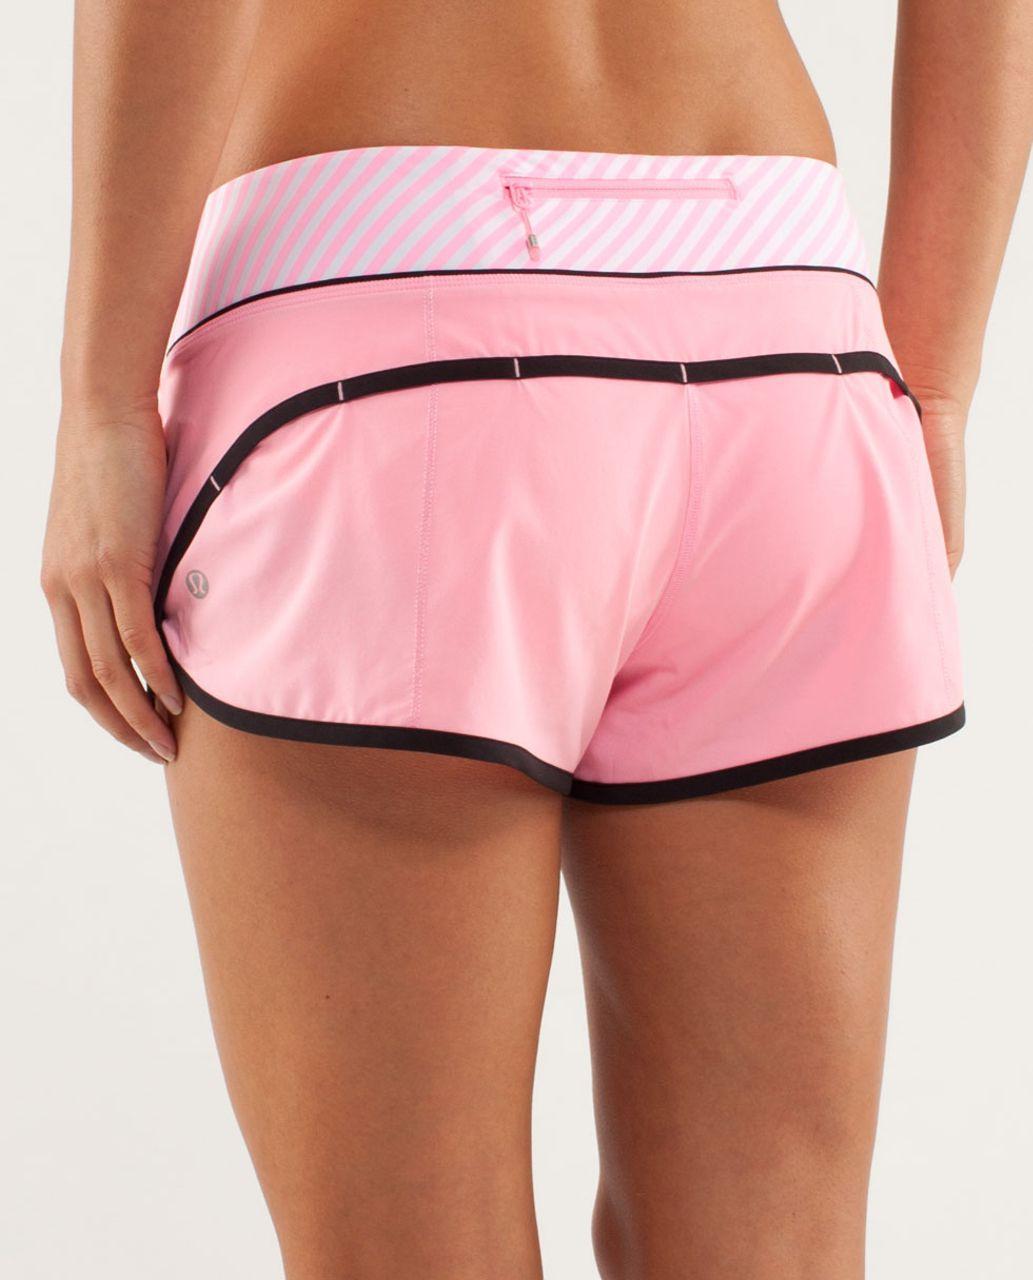 Lululemon Run:  Speed Short - Pink Shell / Classic Stripe White Pink Shell / Black